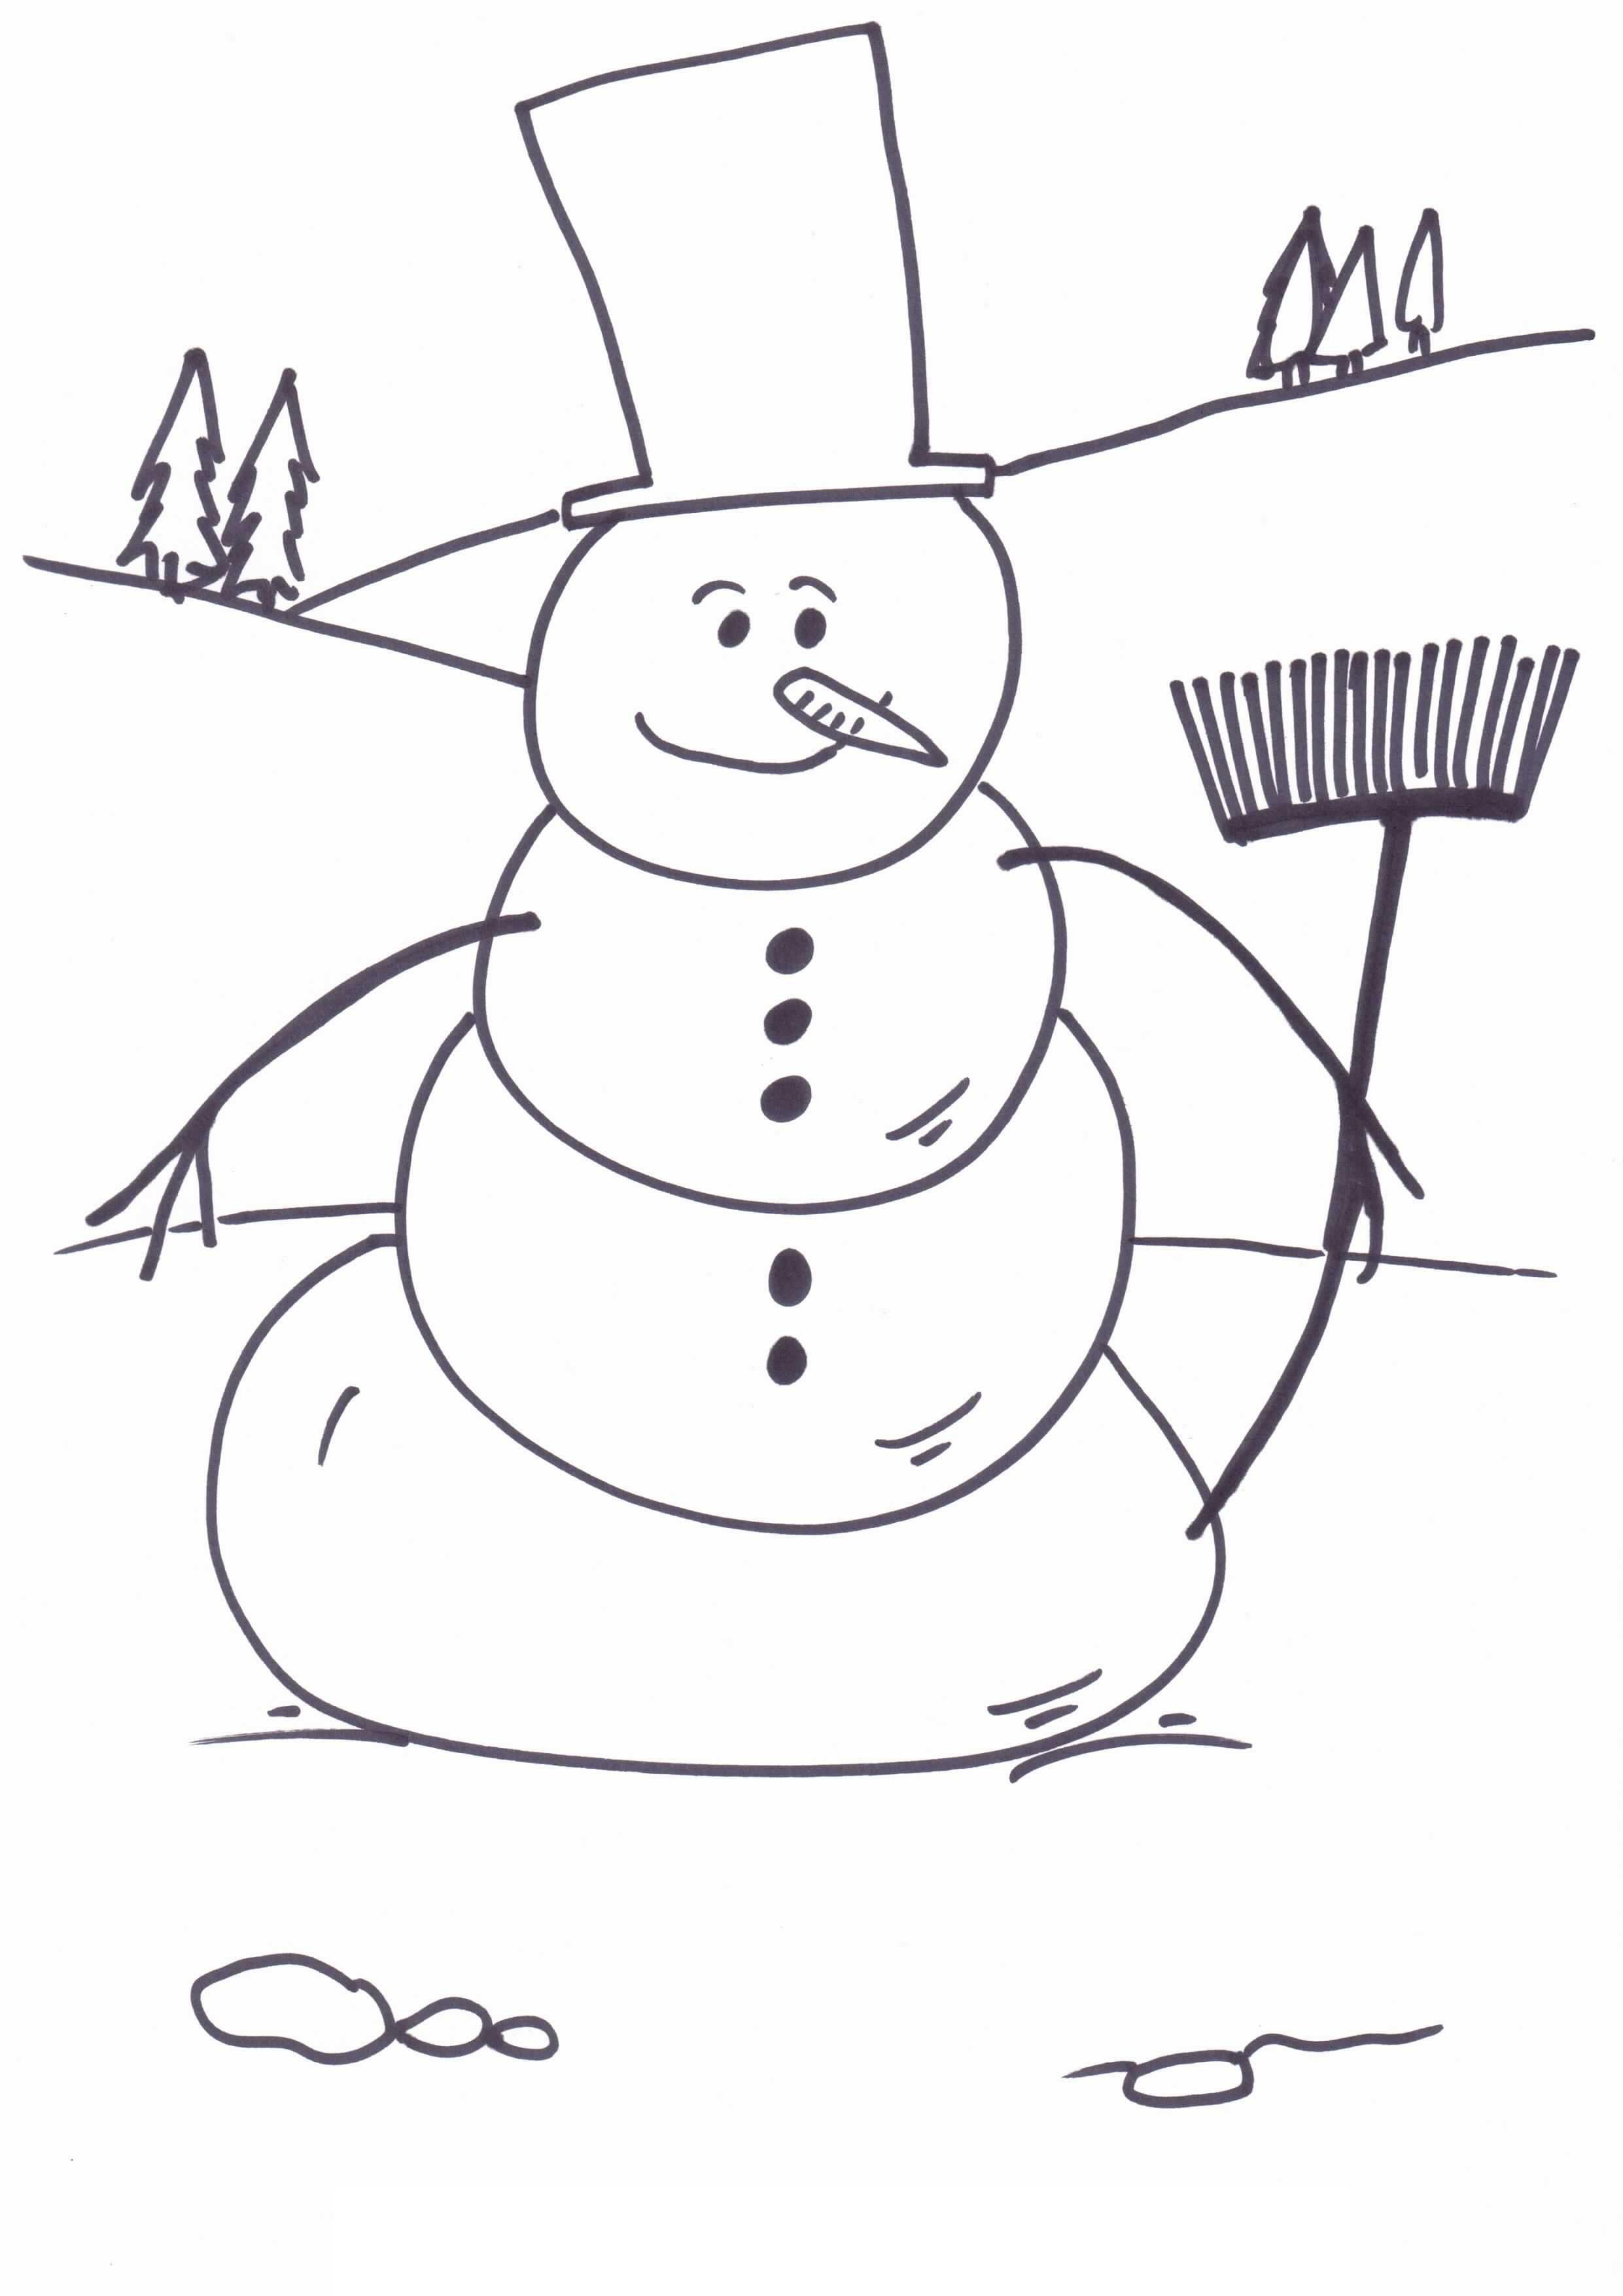 Decisive Printable Snowman